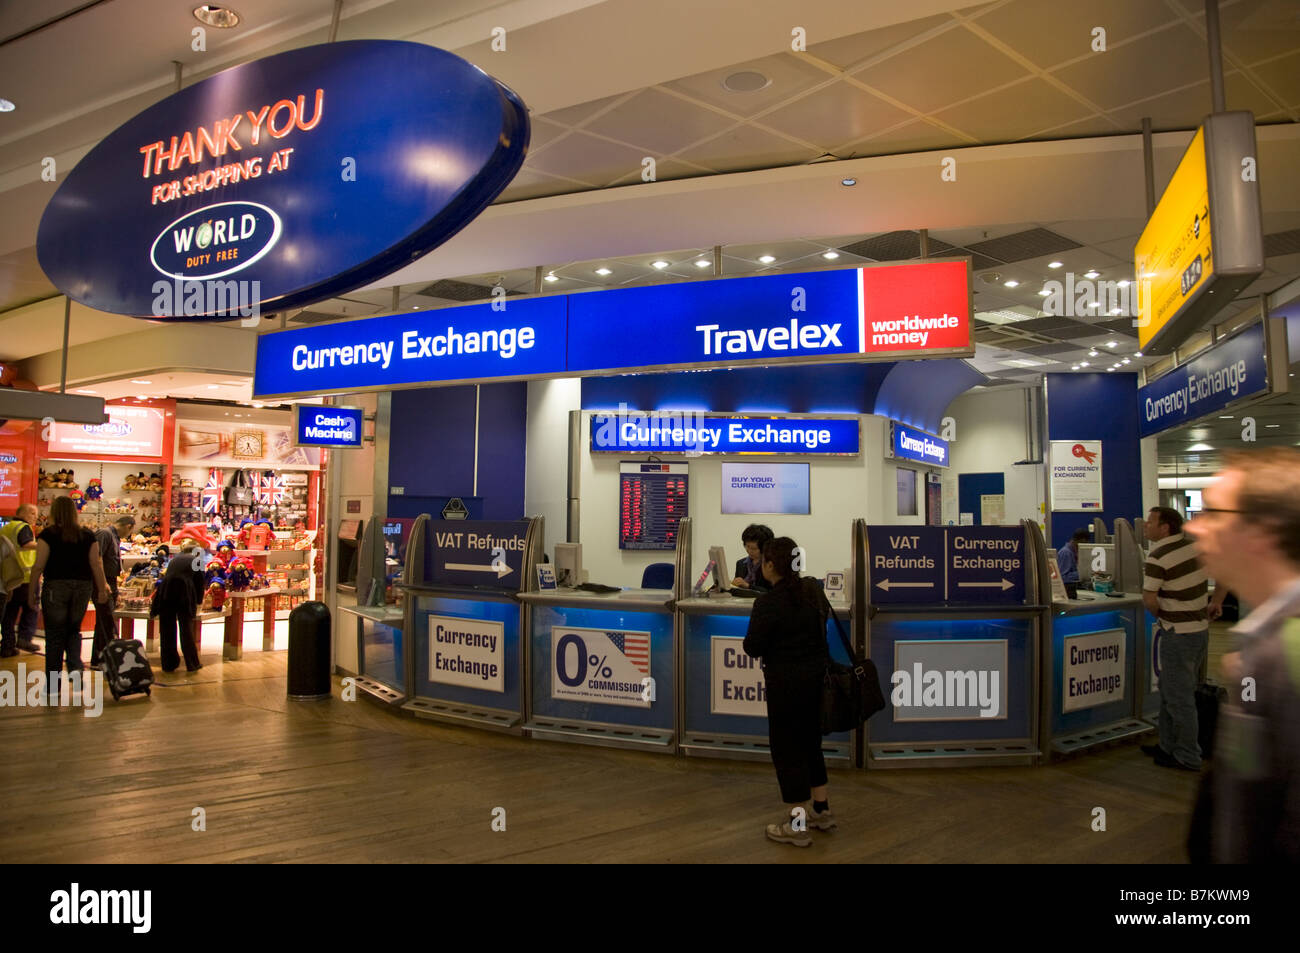 Bureau de change malaysia airports holdings berhad